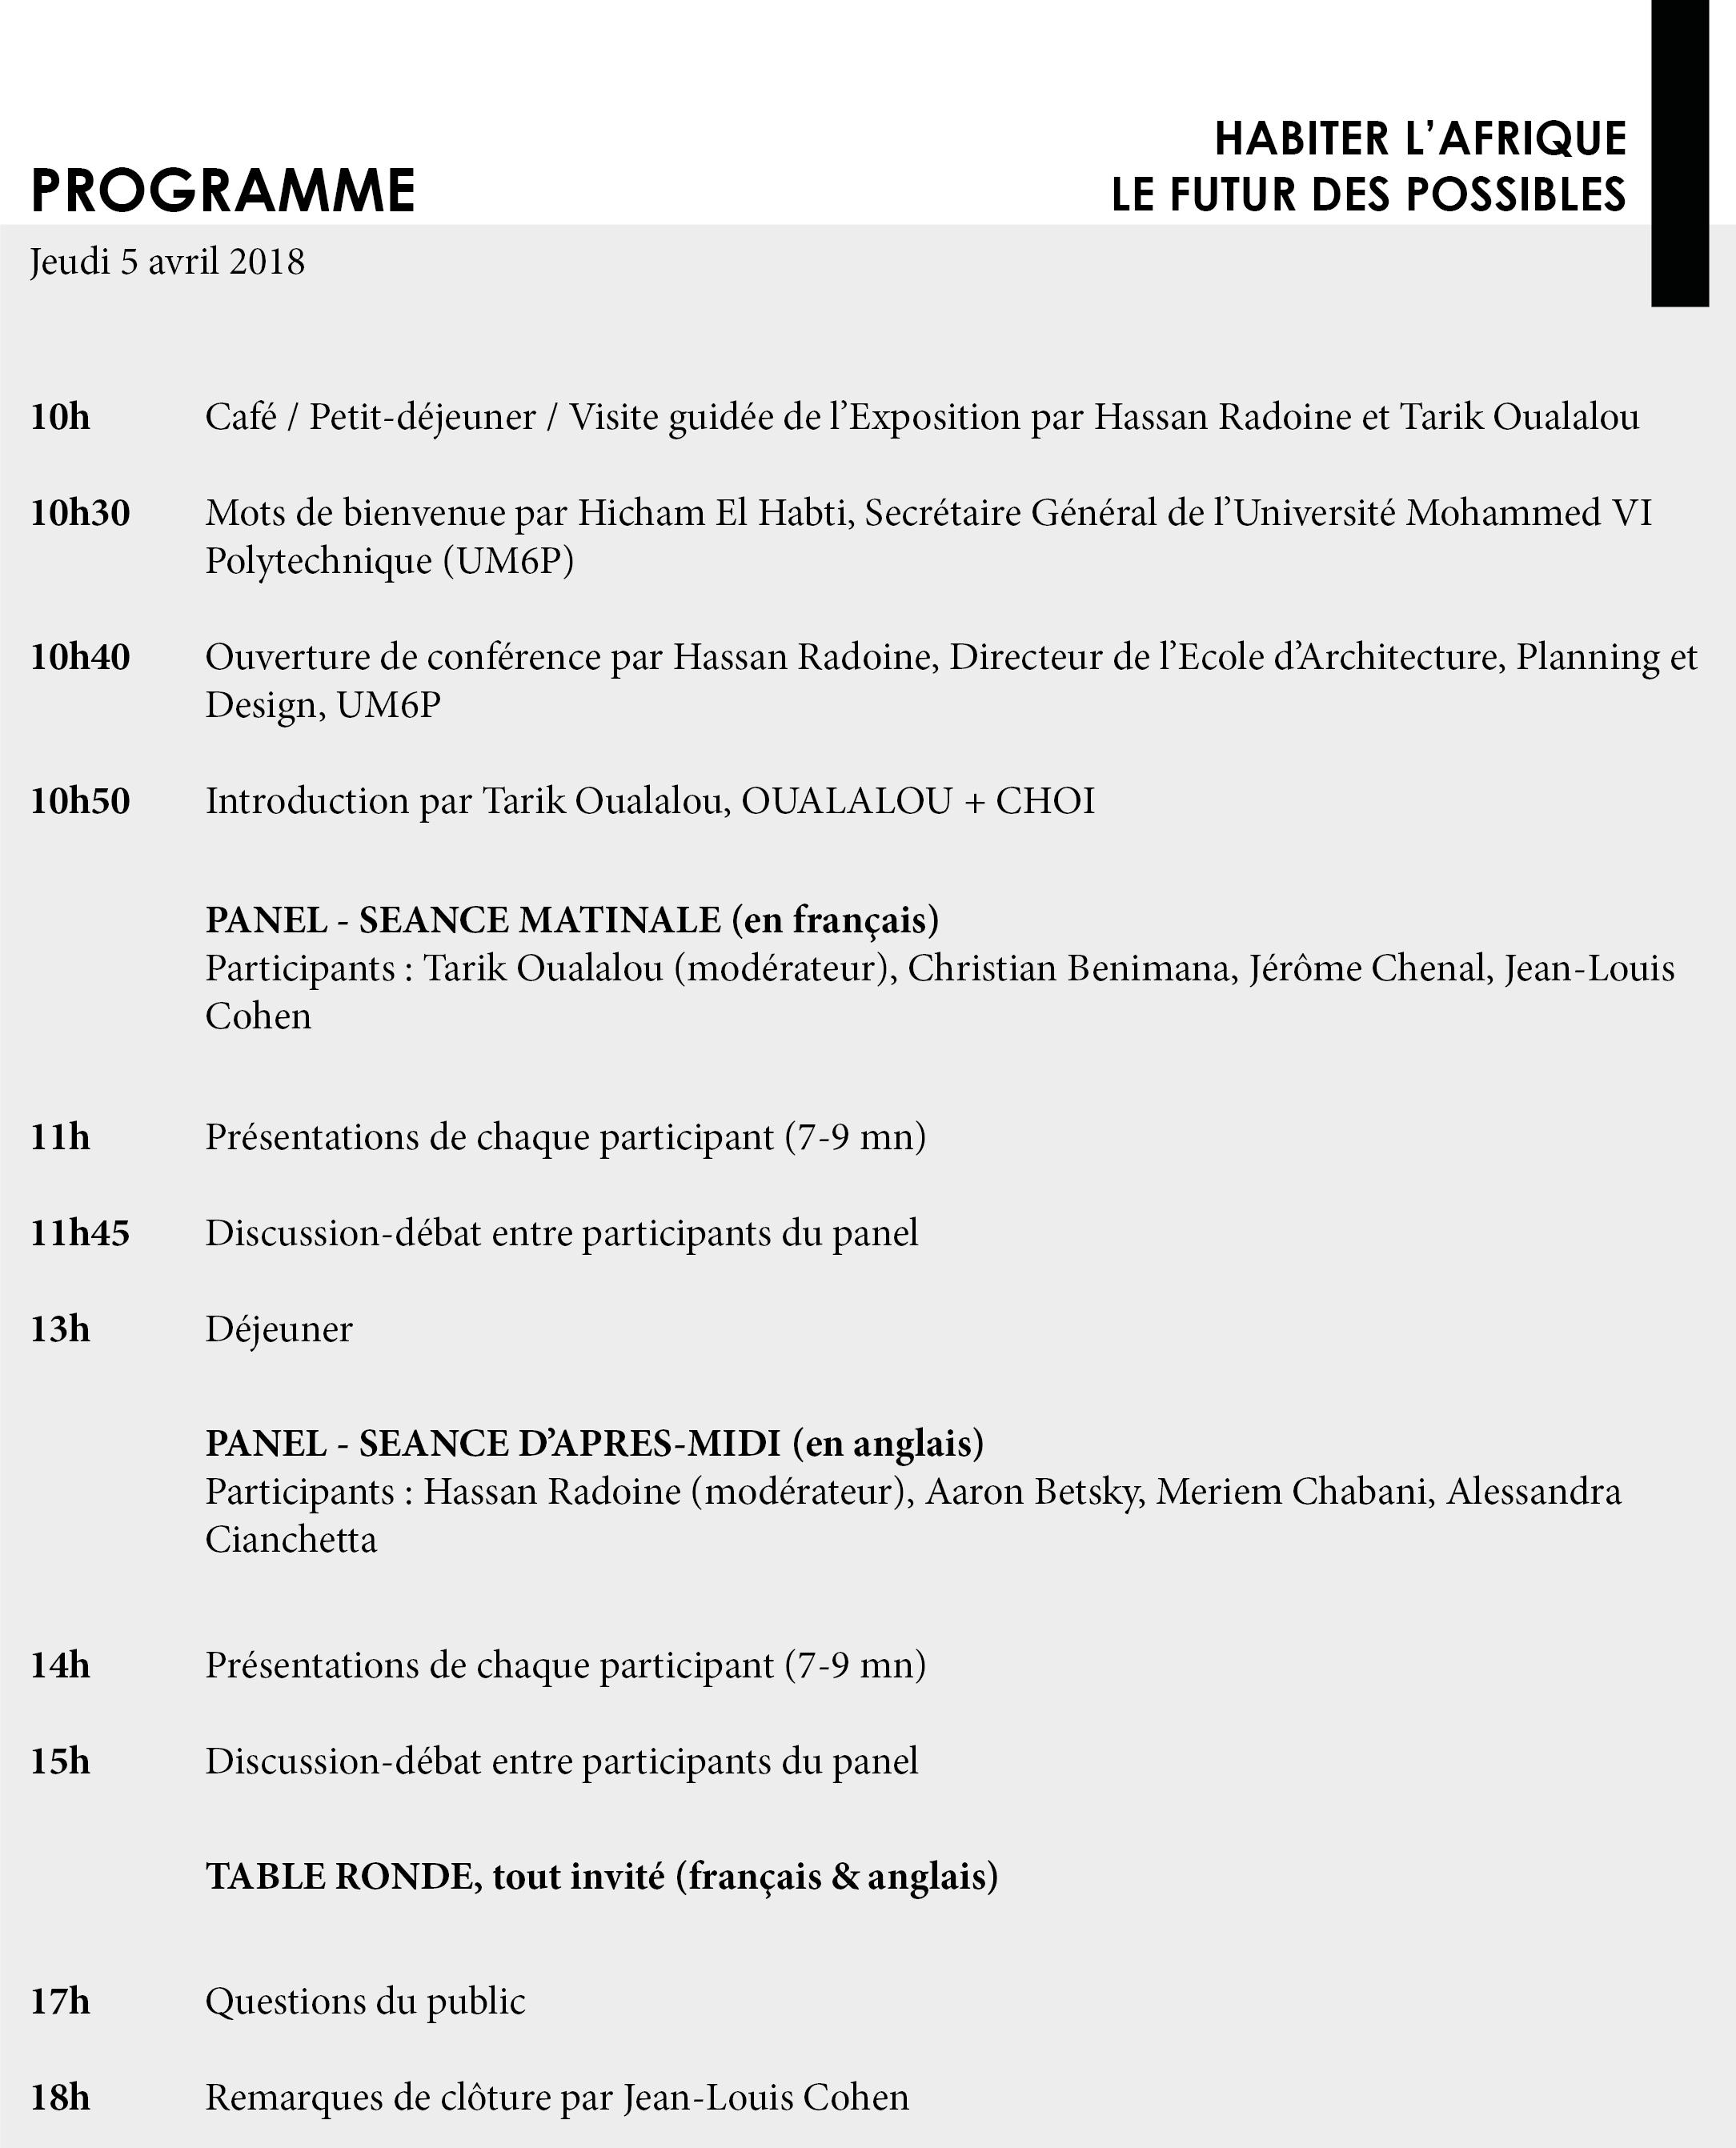 Programme_FR HD.jpg